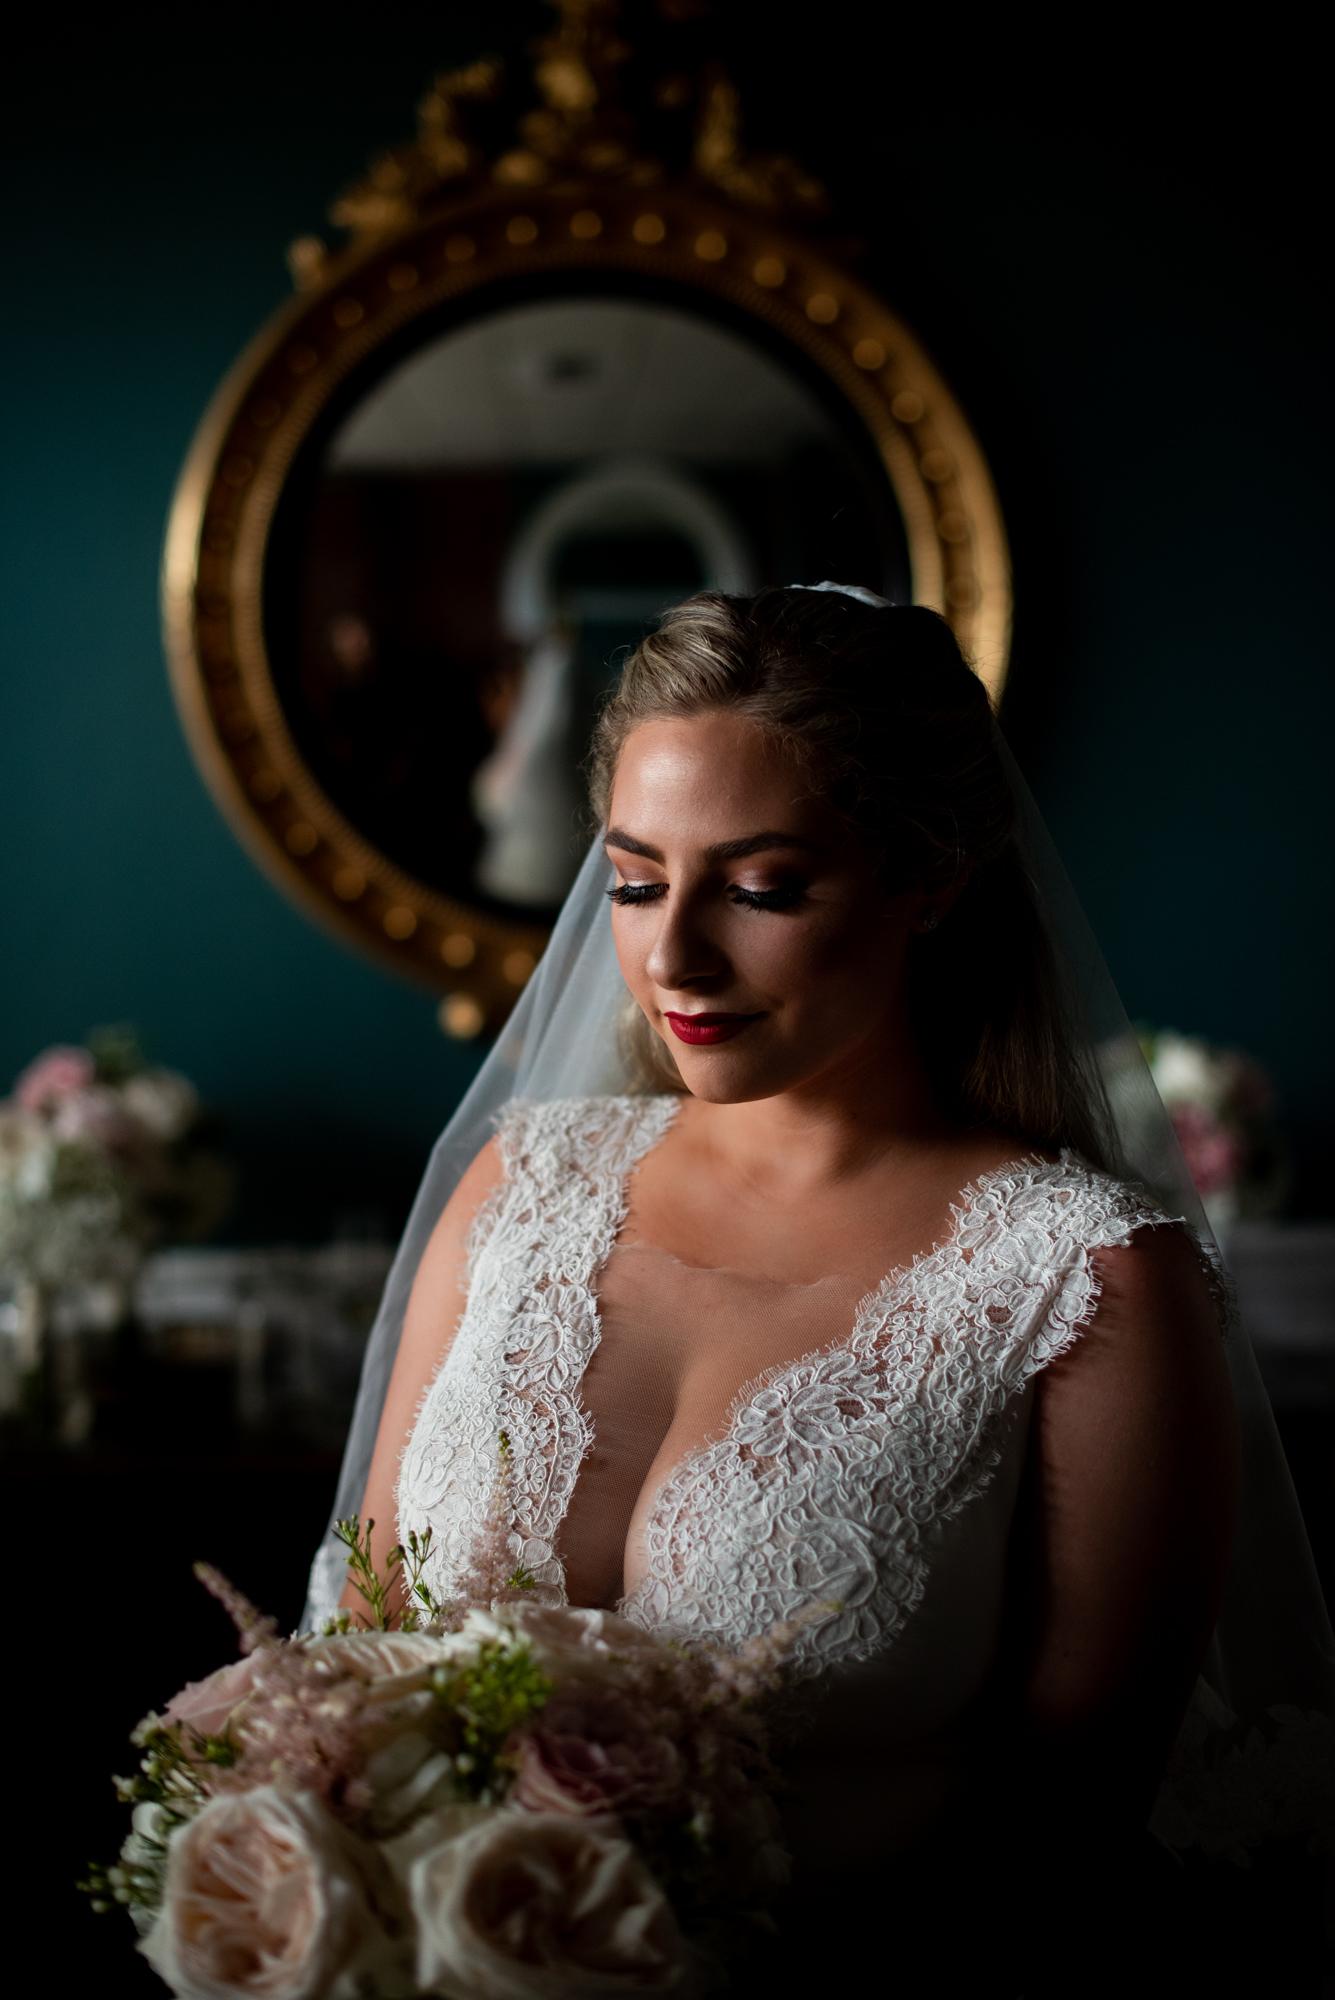 st-augustine-photographer-st-augustine-gay-wedding-sam-sex-wedding-photographer-sarah-annay-photography-white-room-weddings-16.jpg